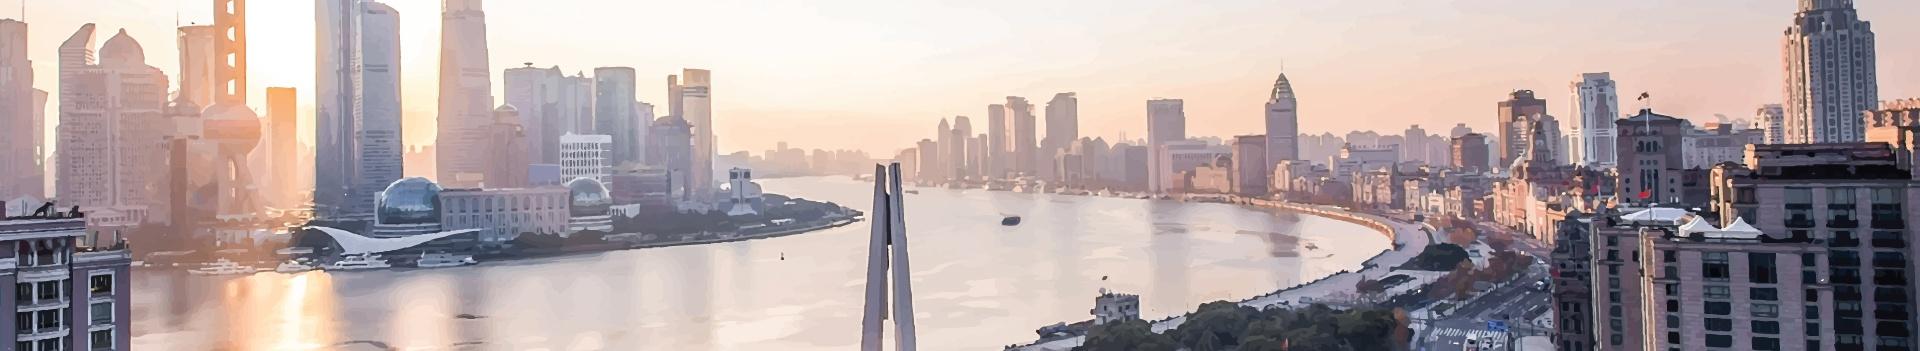 Kitesurfing in China